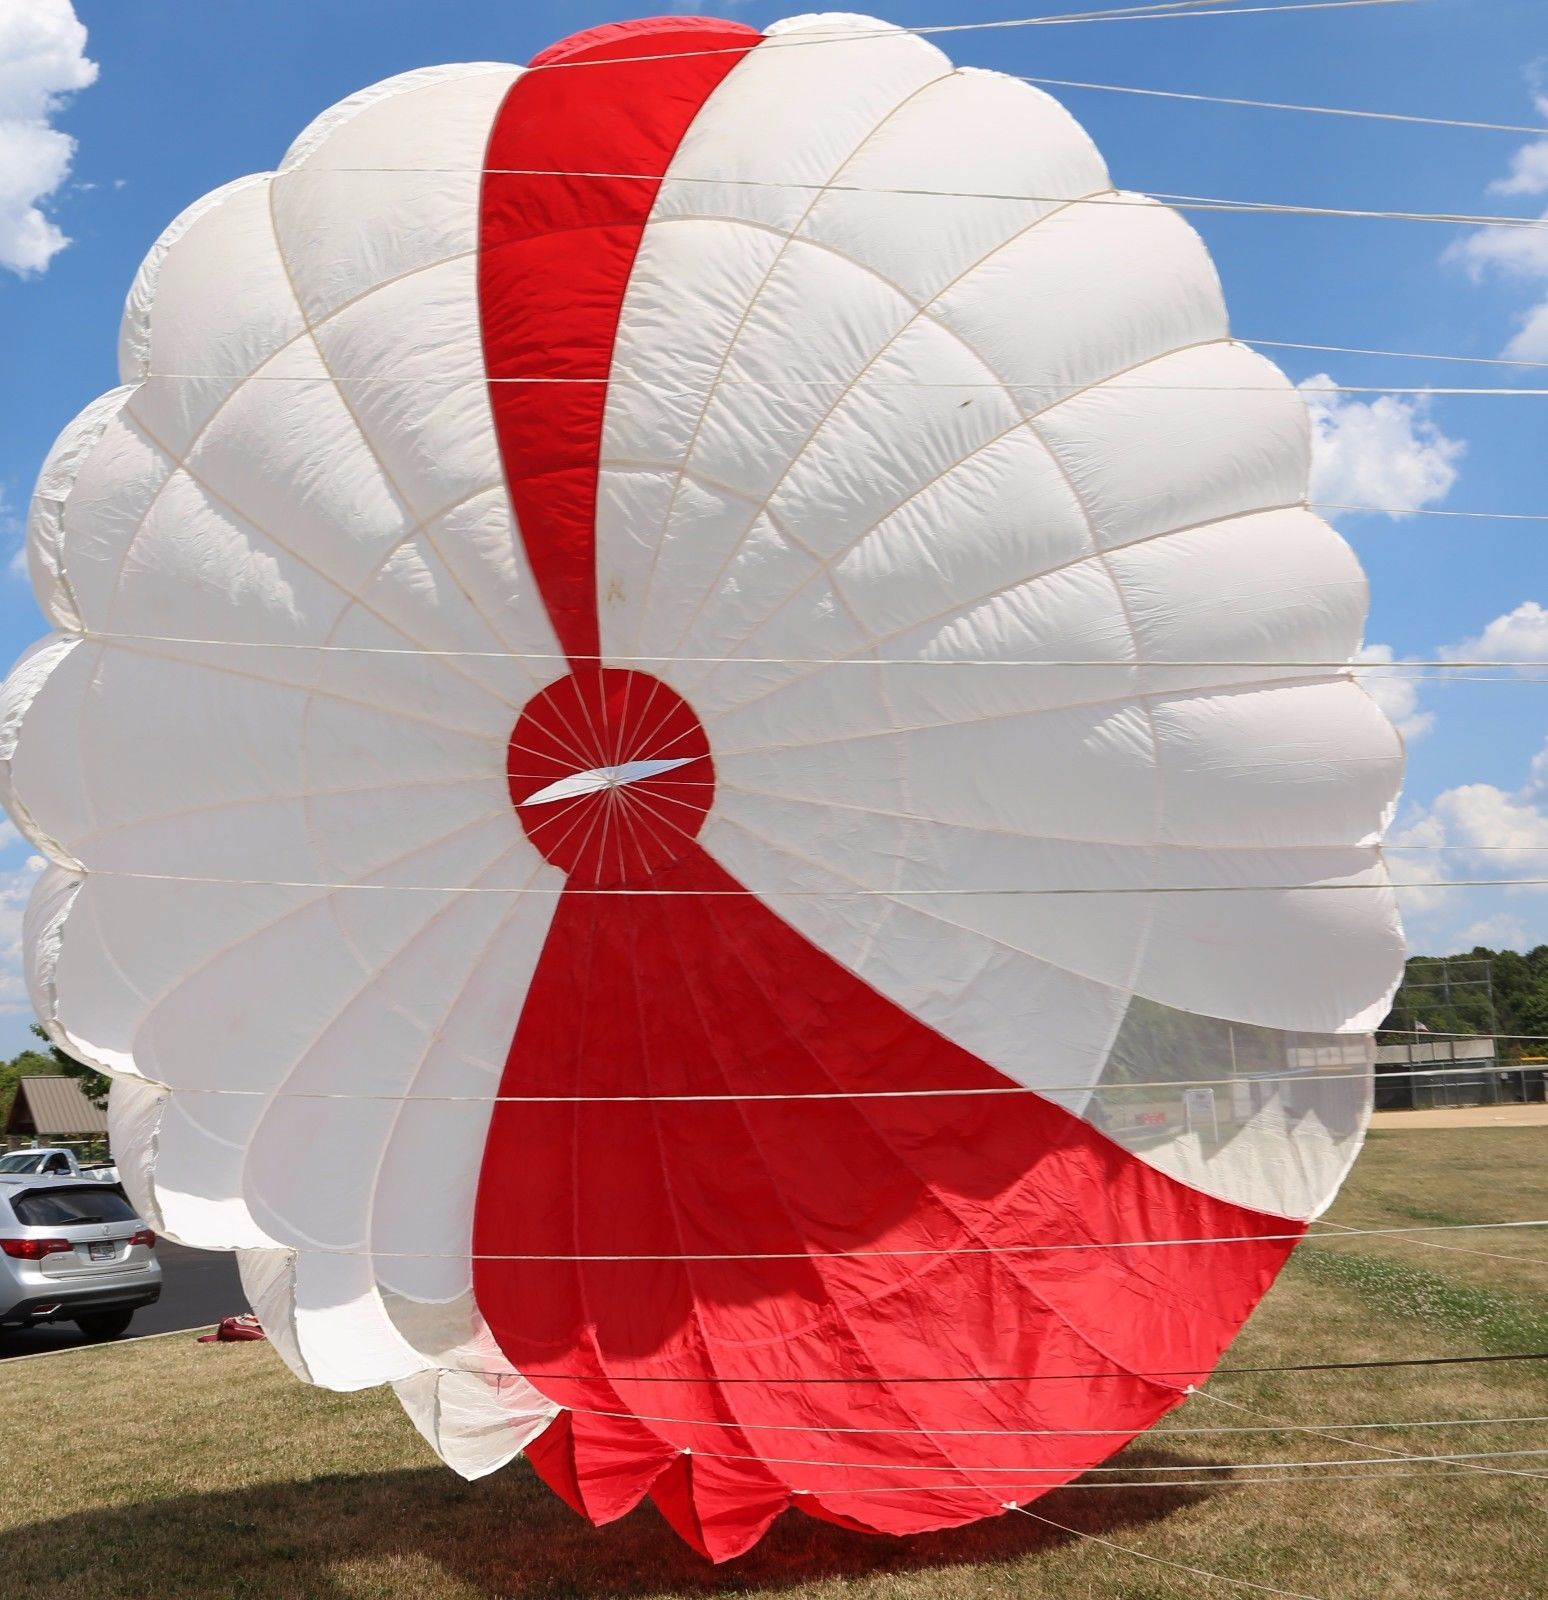 Pioneer 23ft Steerable Vintage Round Reserve Skydiving Parachute Canopy Skydiving Parachute Skydiving Parachute